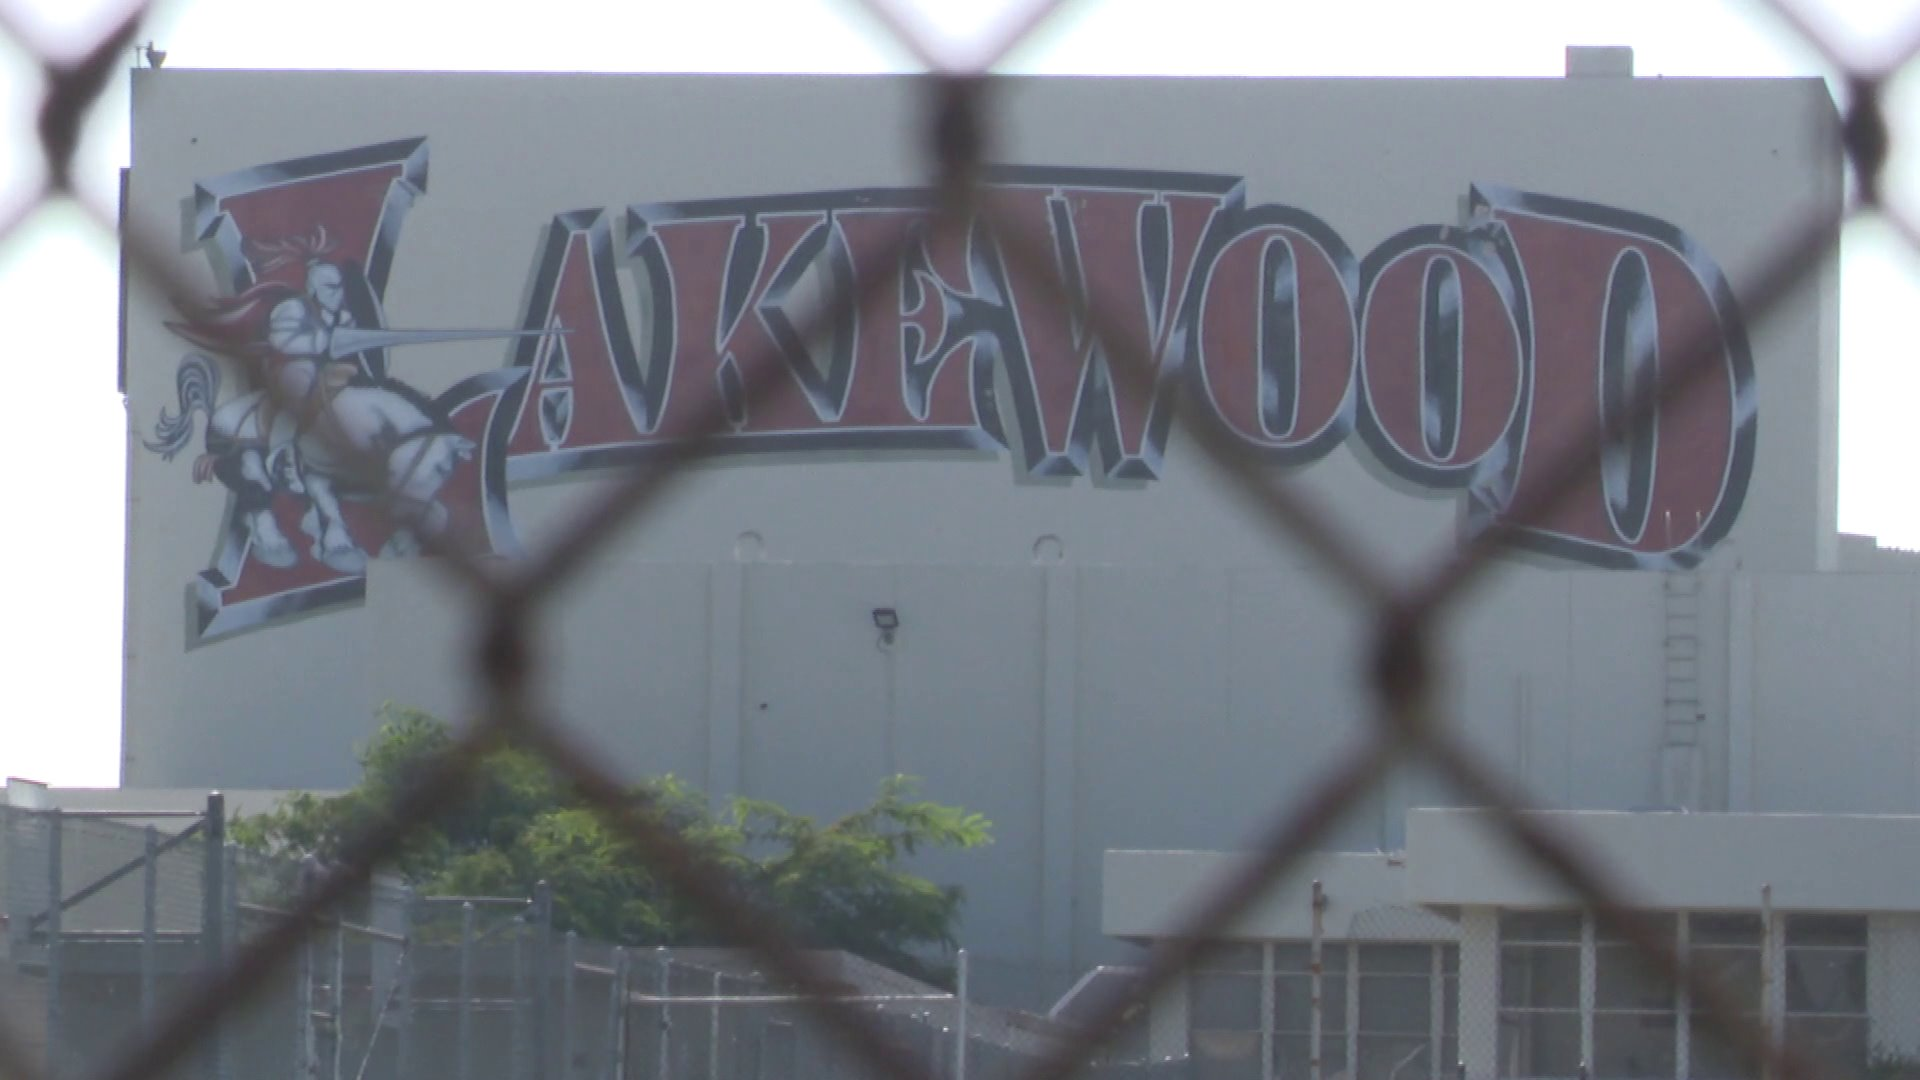 Lakewood High School on Briercrest Avenue in Lakewood is seen on Sept. 2, 2018. (Credit: KTLA)